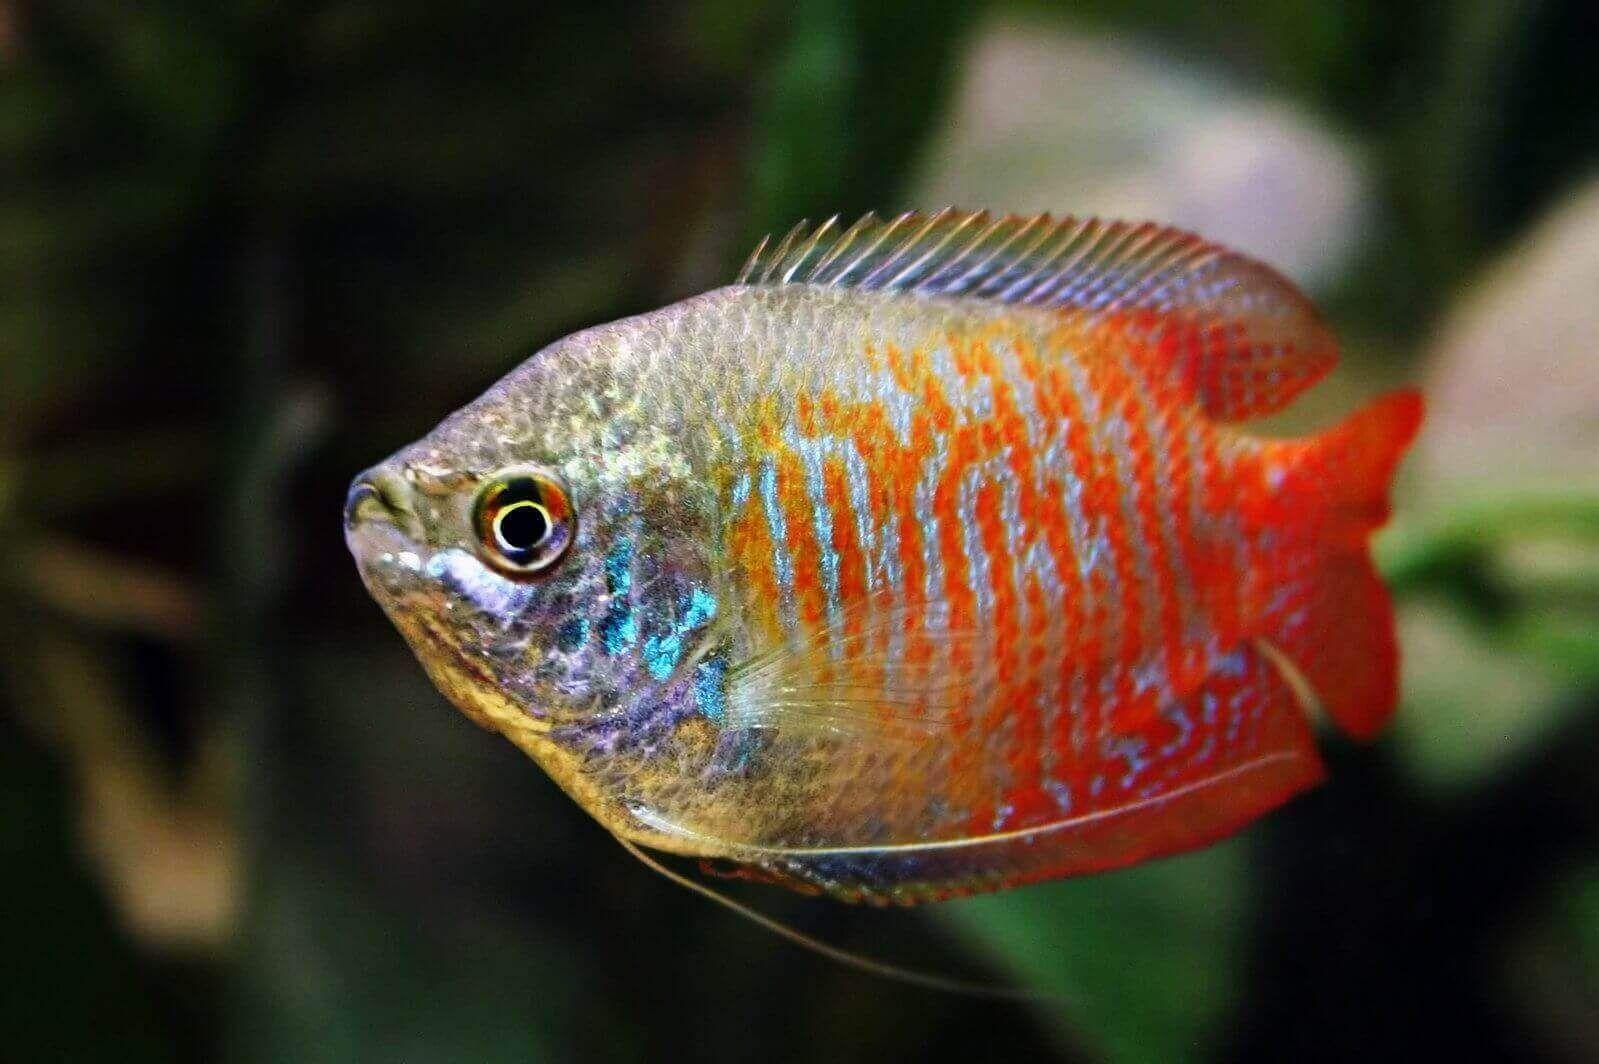 Red Dwarf Gourami Colisa Lalia Di 2020 Ikan Tropis Ikan